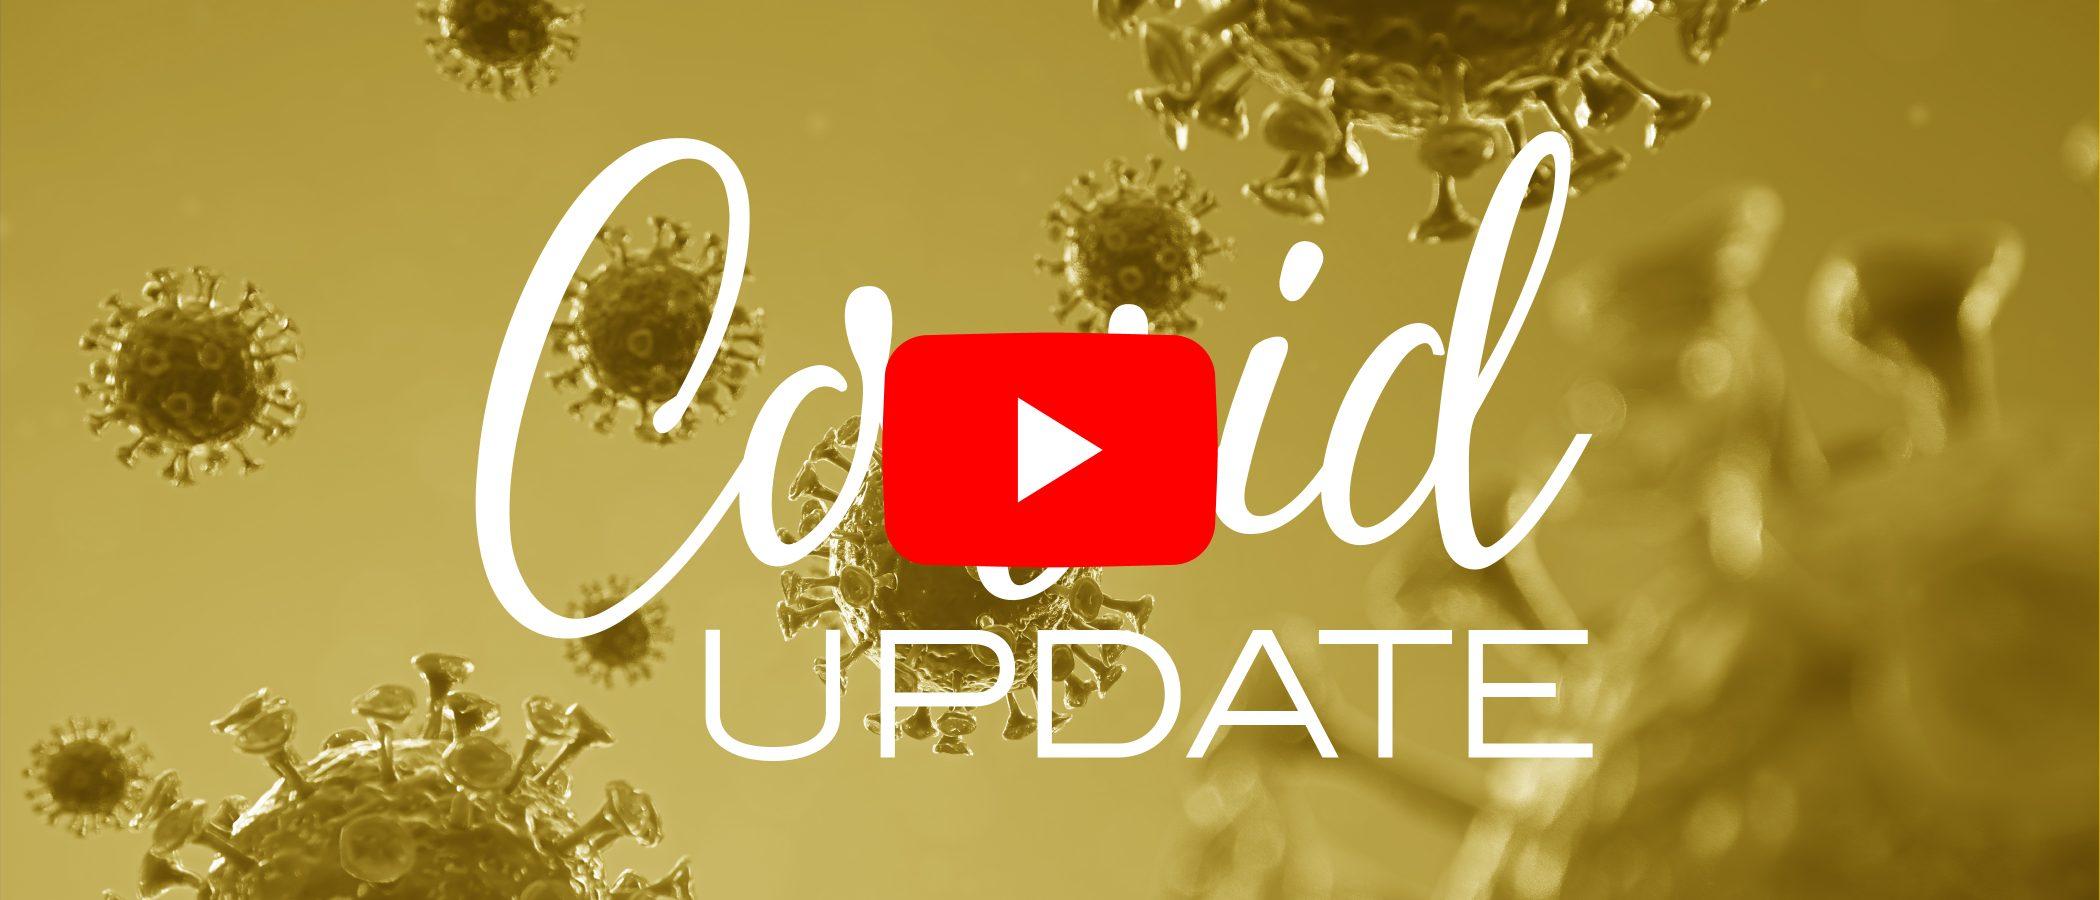 covid-update-11brd-dq2021-web-banner-youtube22x-100